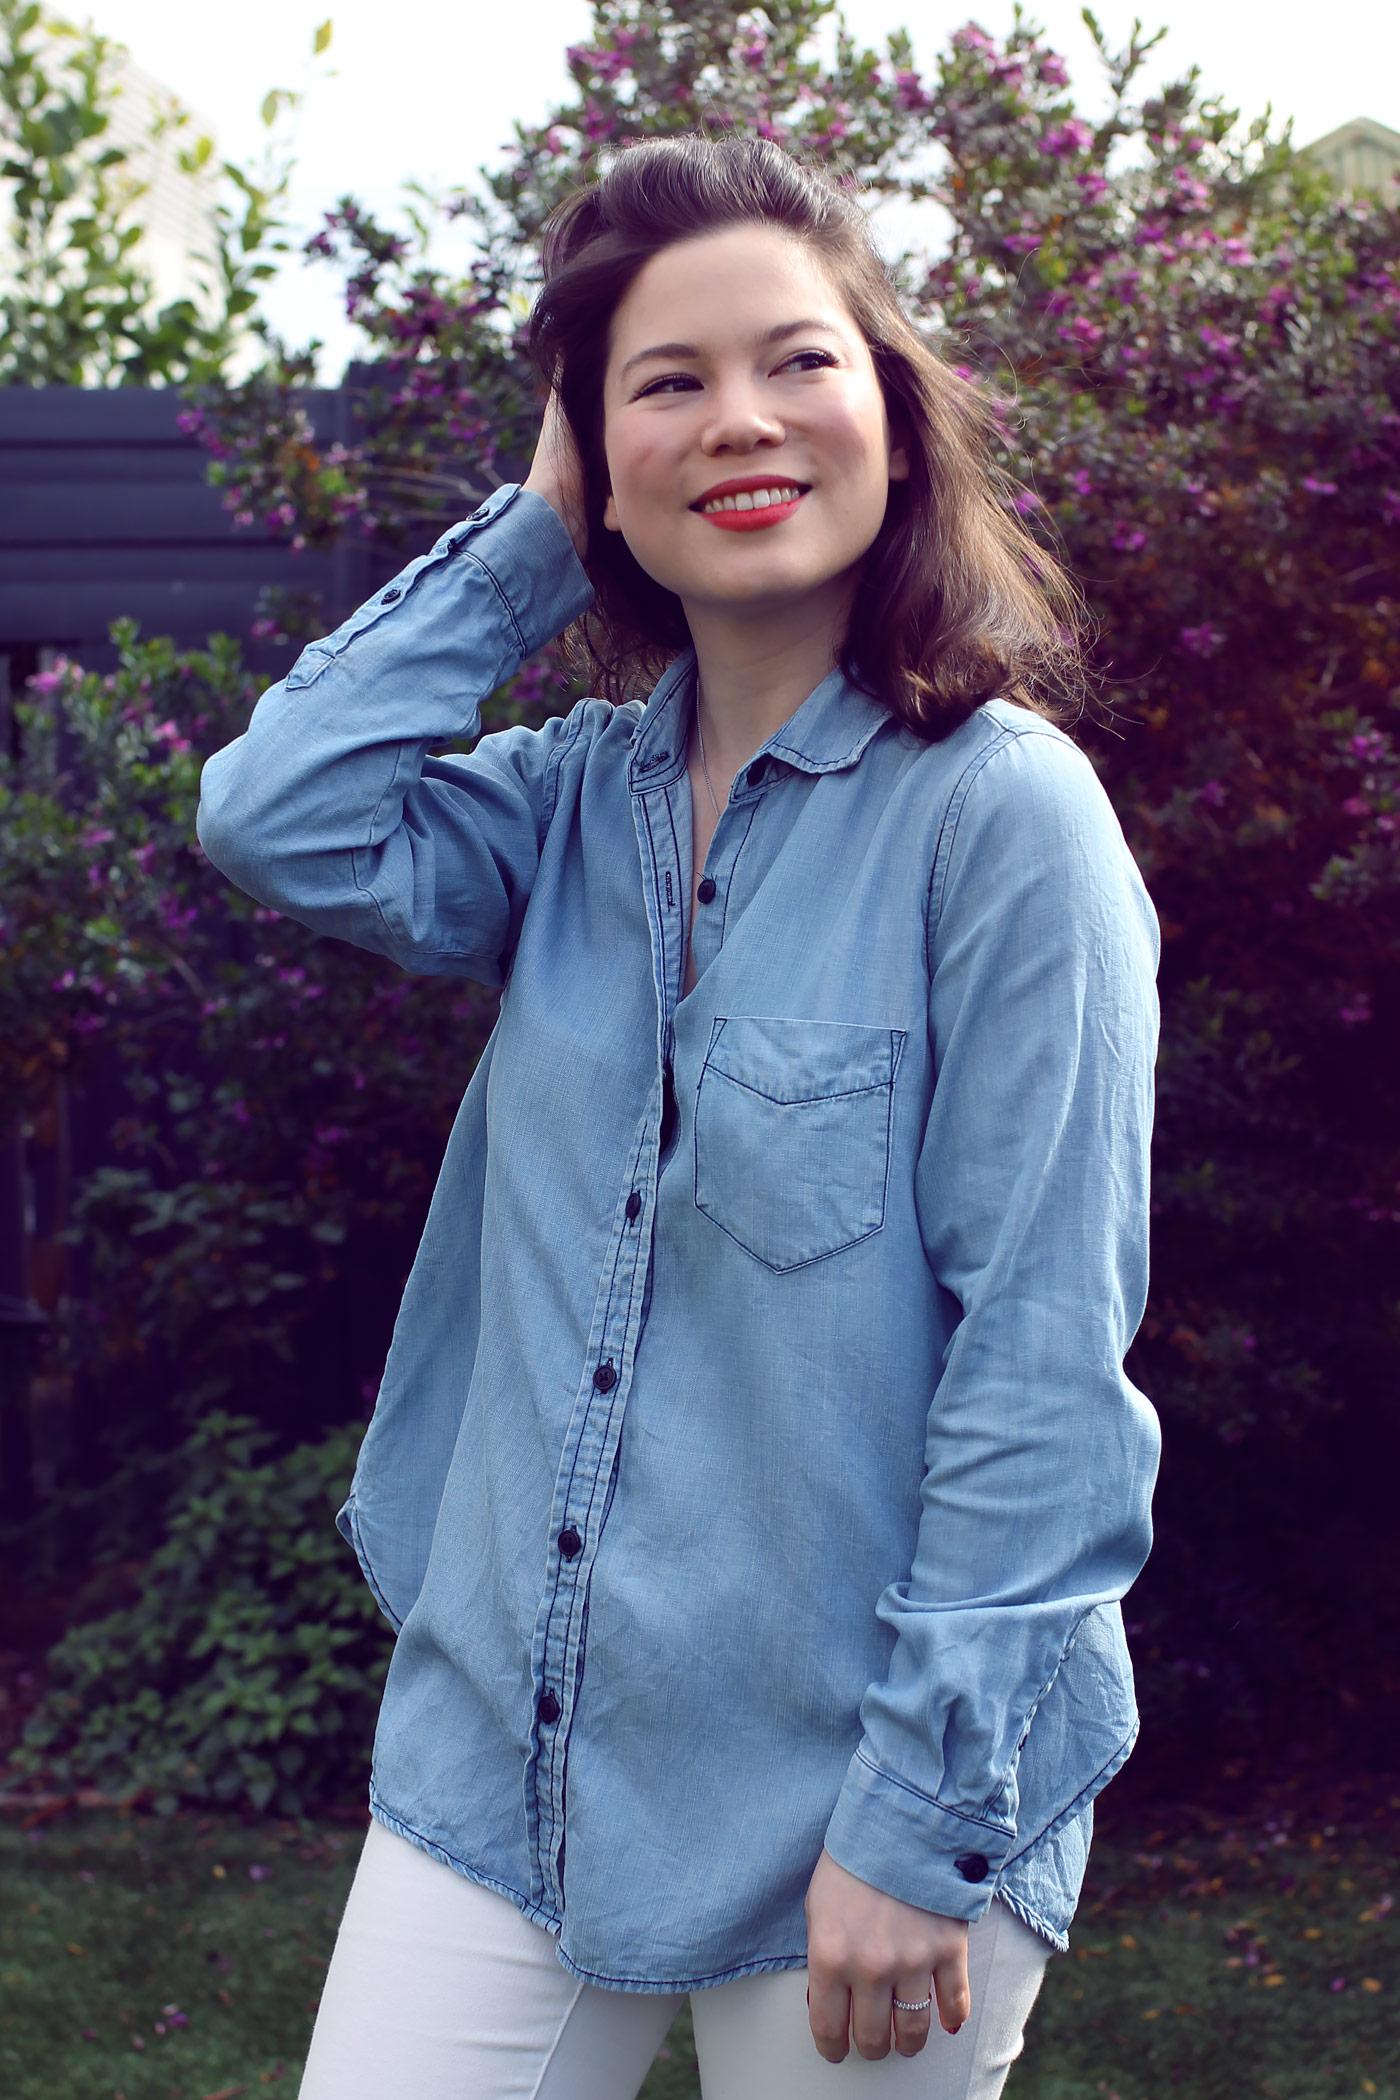 Beauty Evo Hair Lei Lady Lei Melbourne Blogger